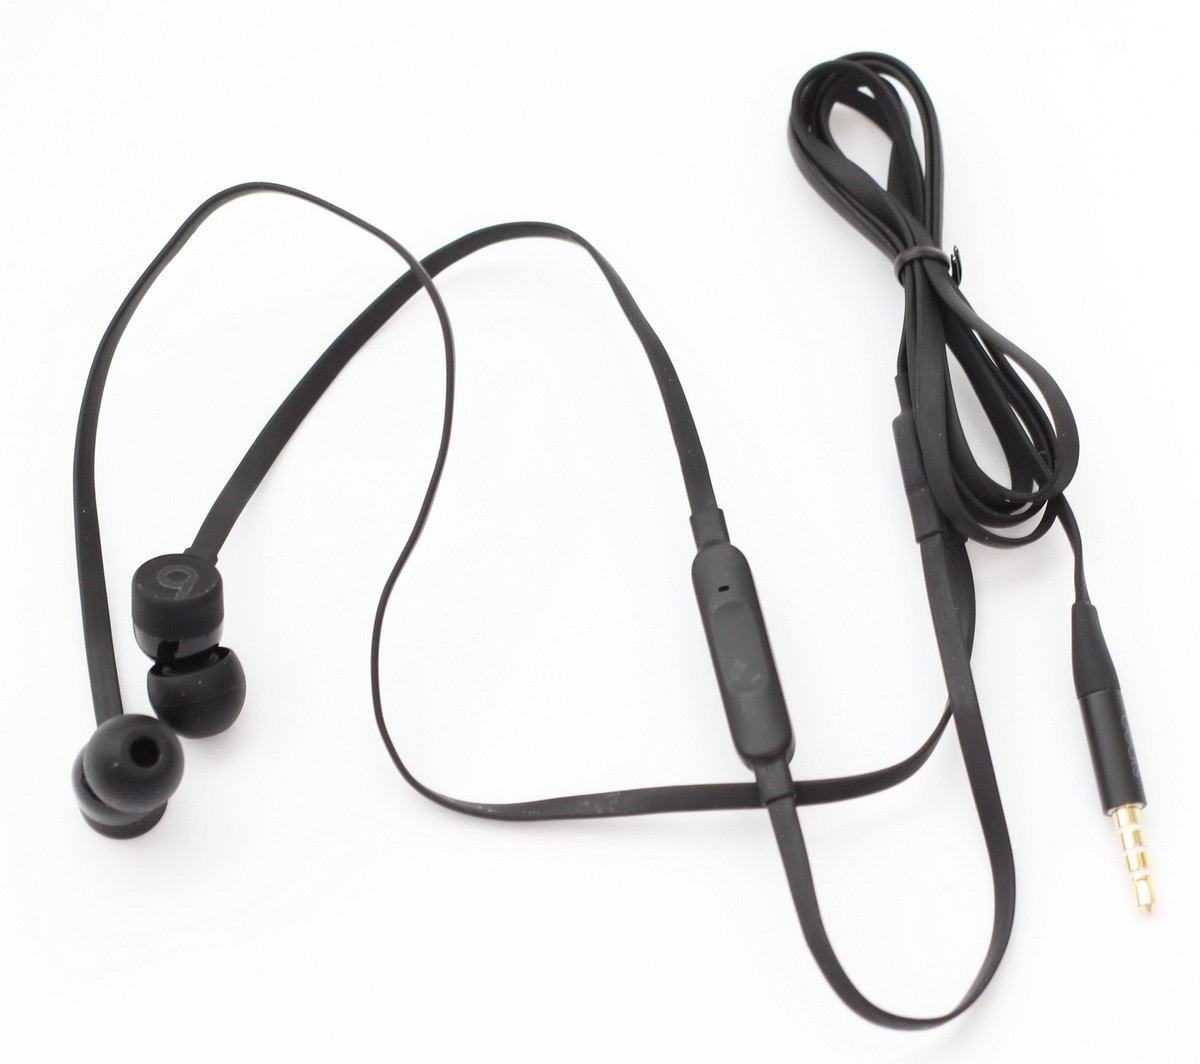 Details about READ- Beats by Dr. Dre urBeats 3 In-Ear Headphones w 3.5mm  Black MQFU2LL A READ! 4bb24ba04c